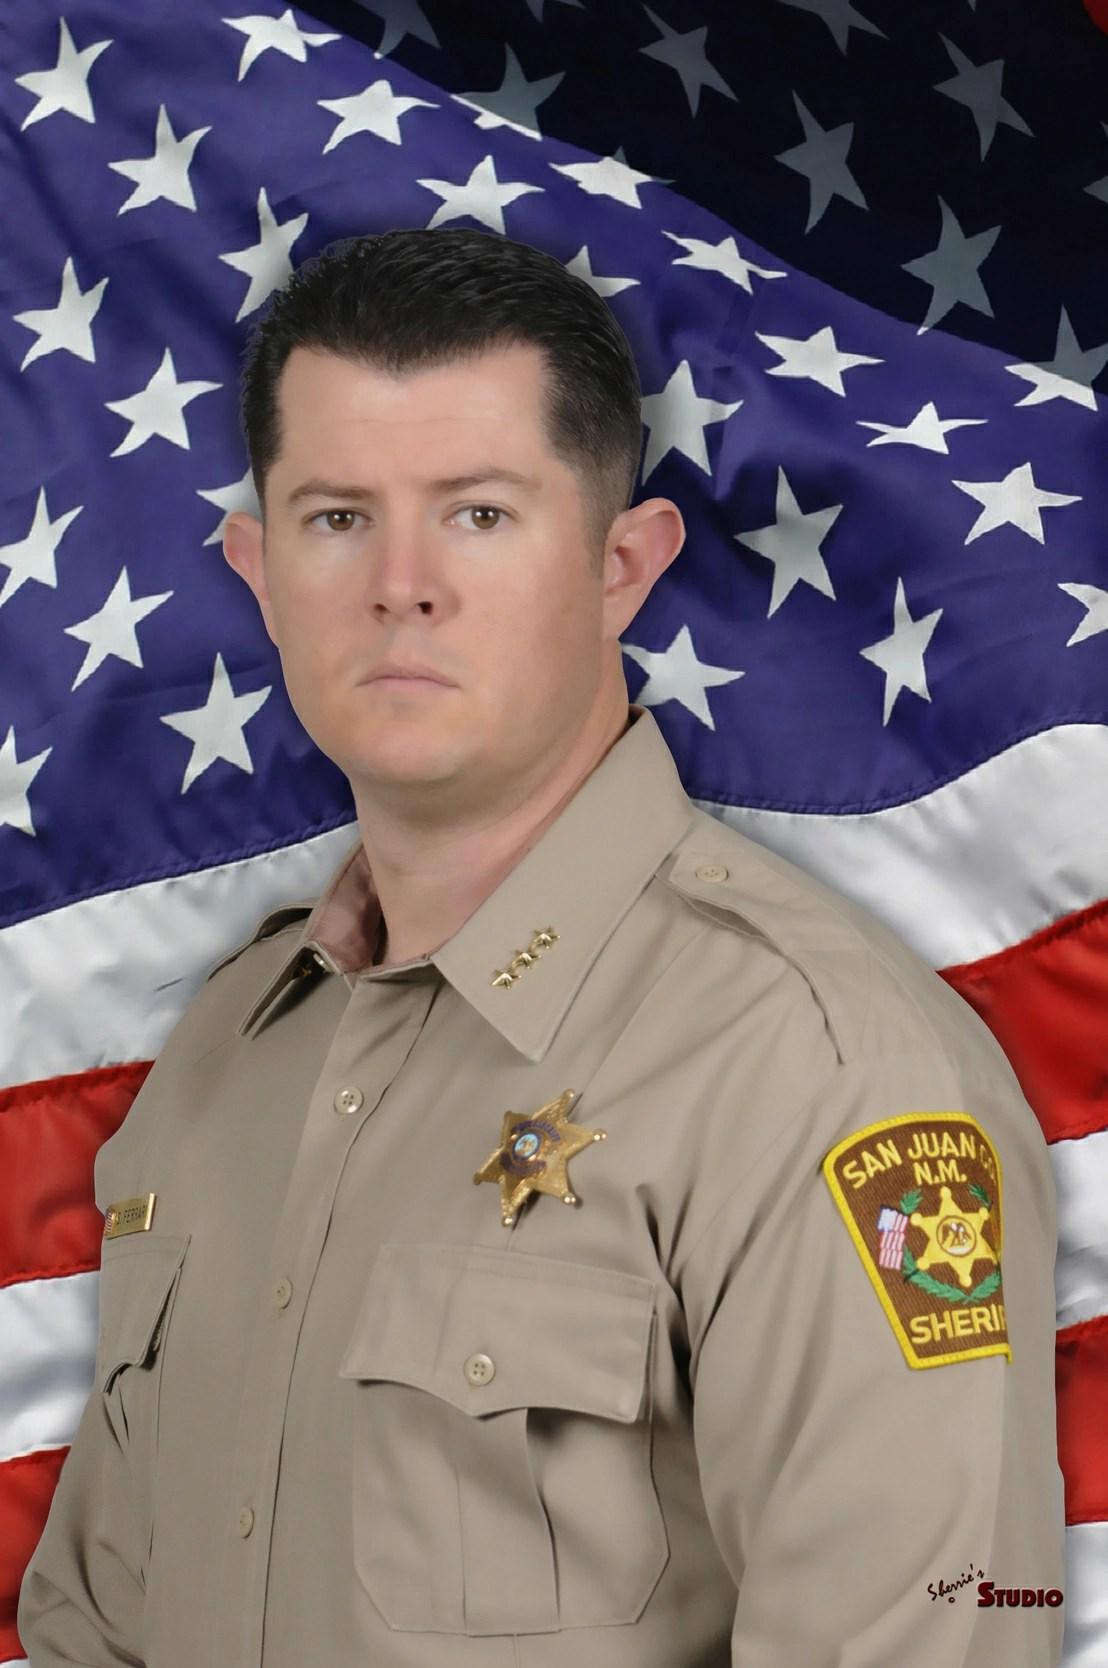 Douglas County Co Sheriff